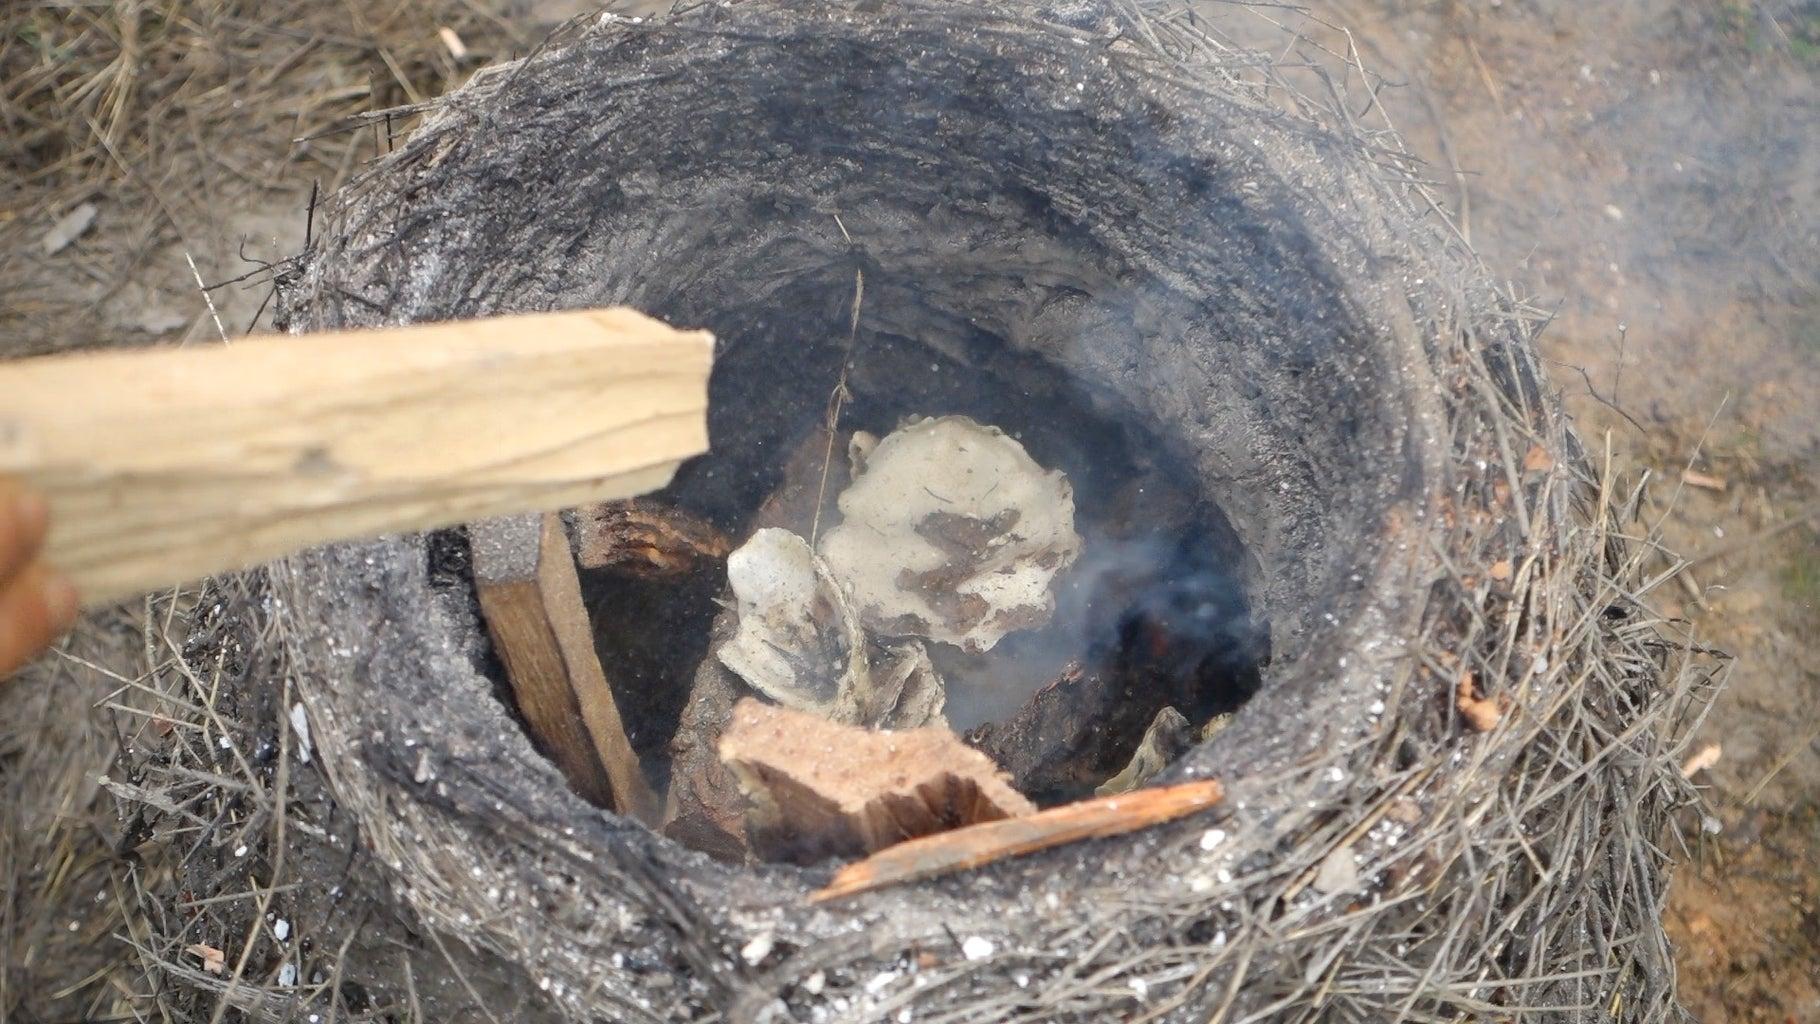 FIRING THE KILN